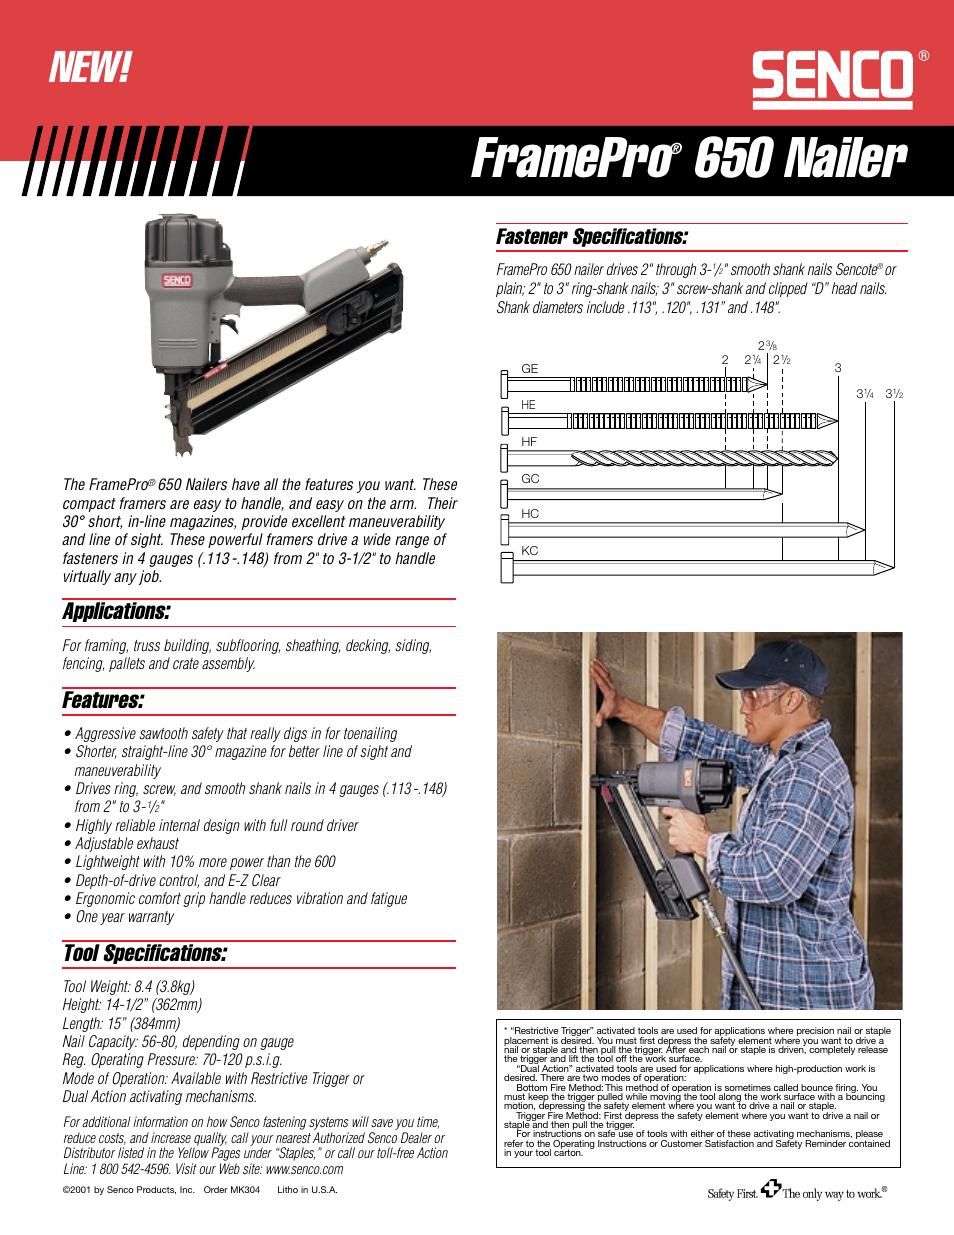 Senco FramePro 650 User Manual | 1 page